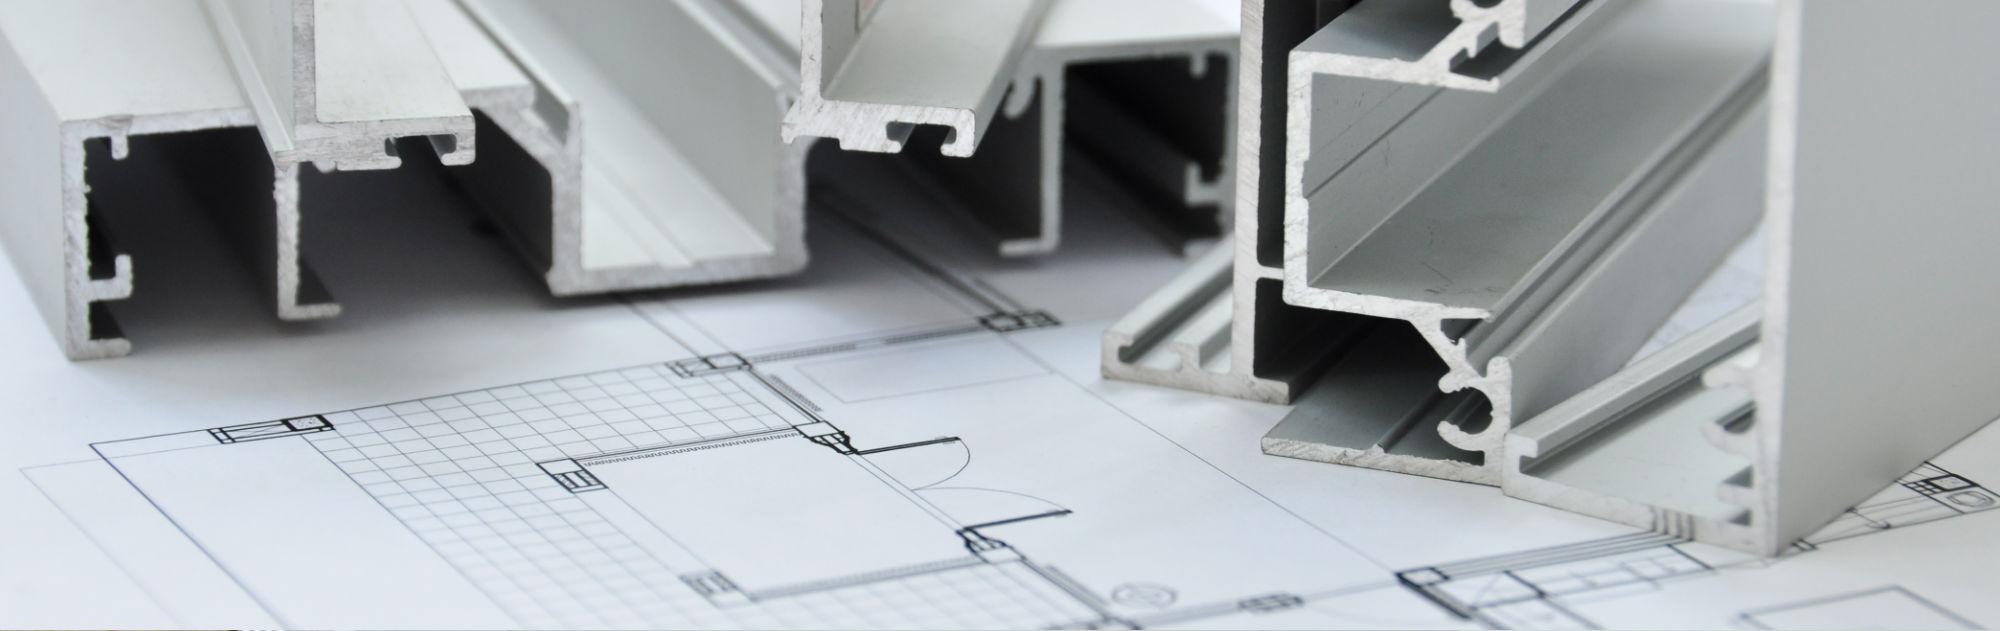 Aberturas de aluminio y vidrio for Aberturas en aluminio